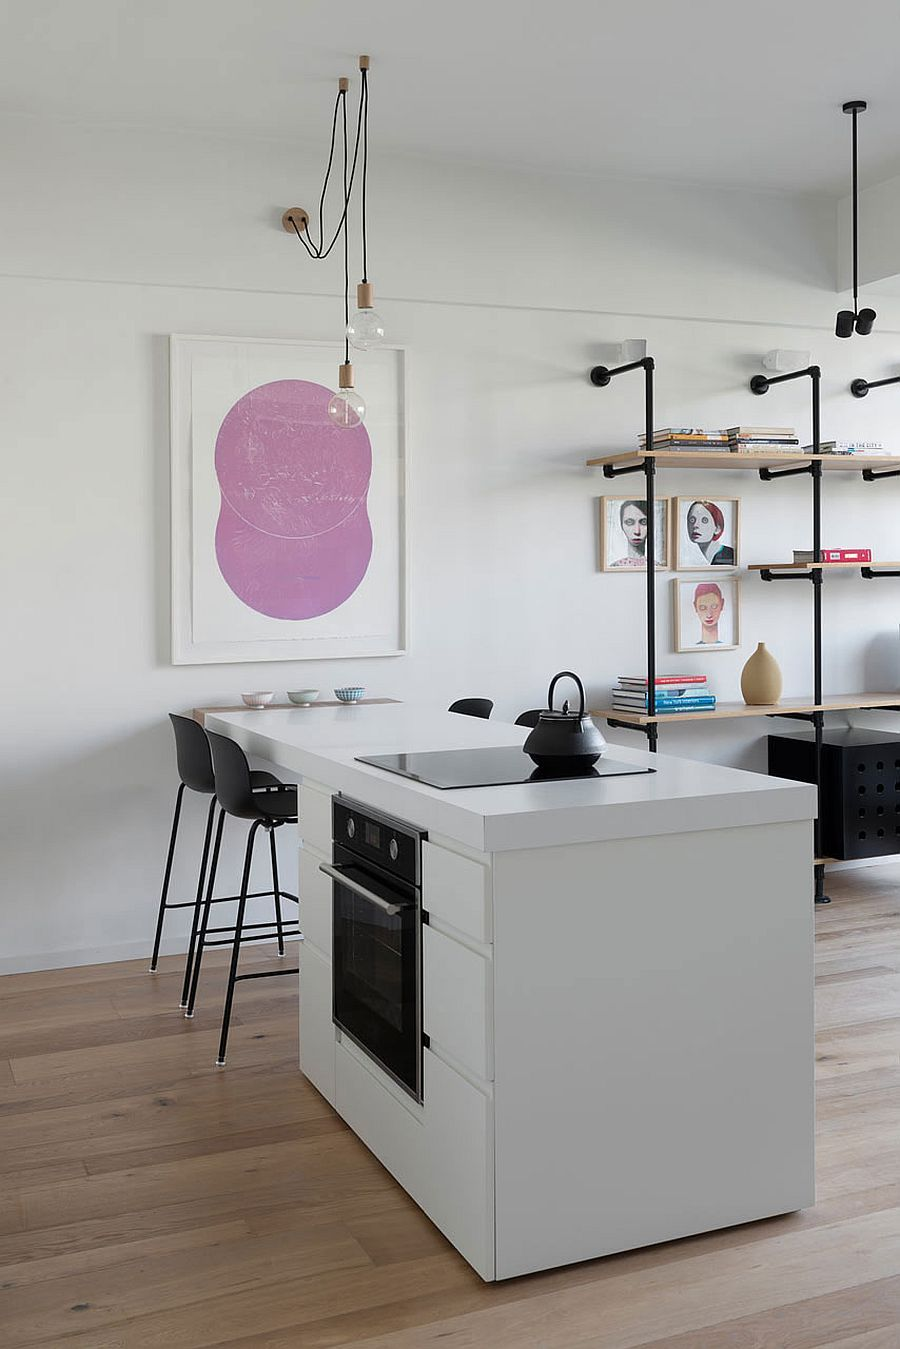 interior kitchen the home tel aviv design | Custom, Space-Saving Partitions Transform Tiny Apartment ...